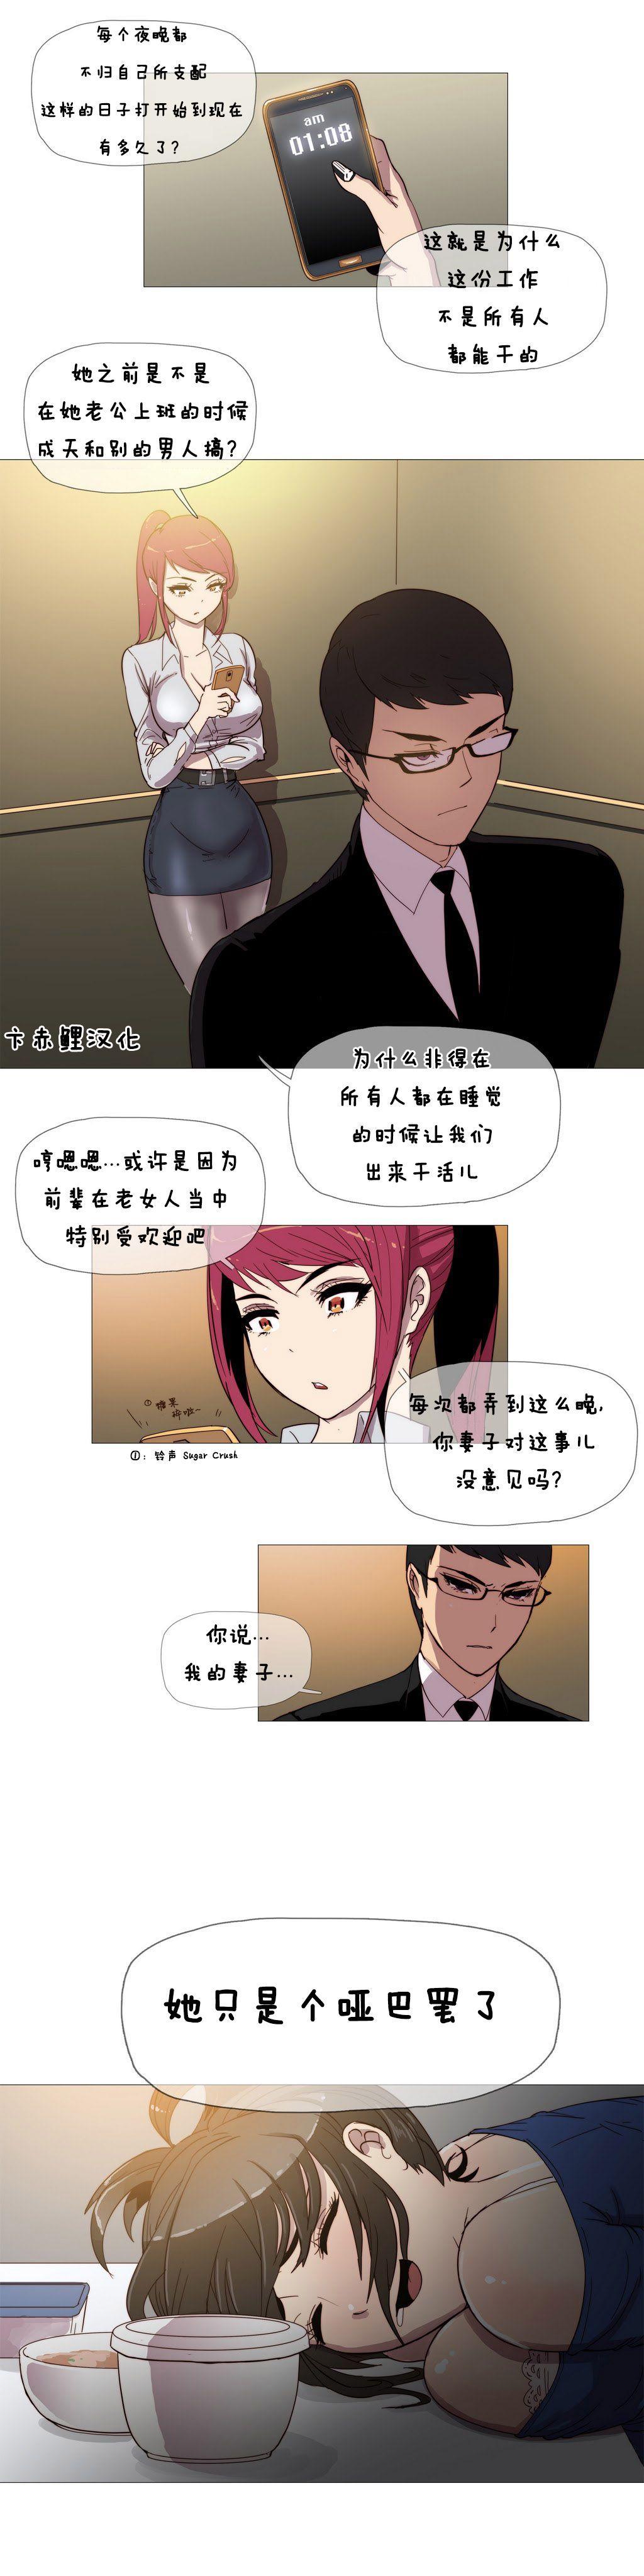 HouseHold Affairs 【卞赤鲤个人汉化】1~33话(持续更新中) 44